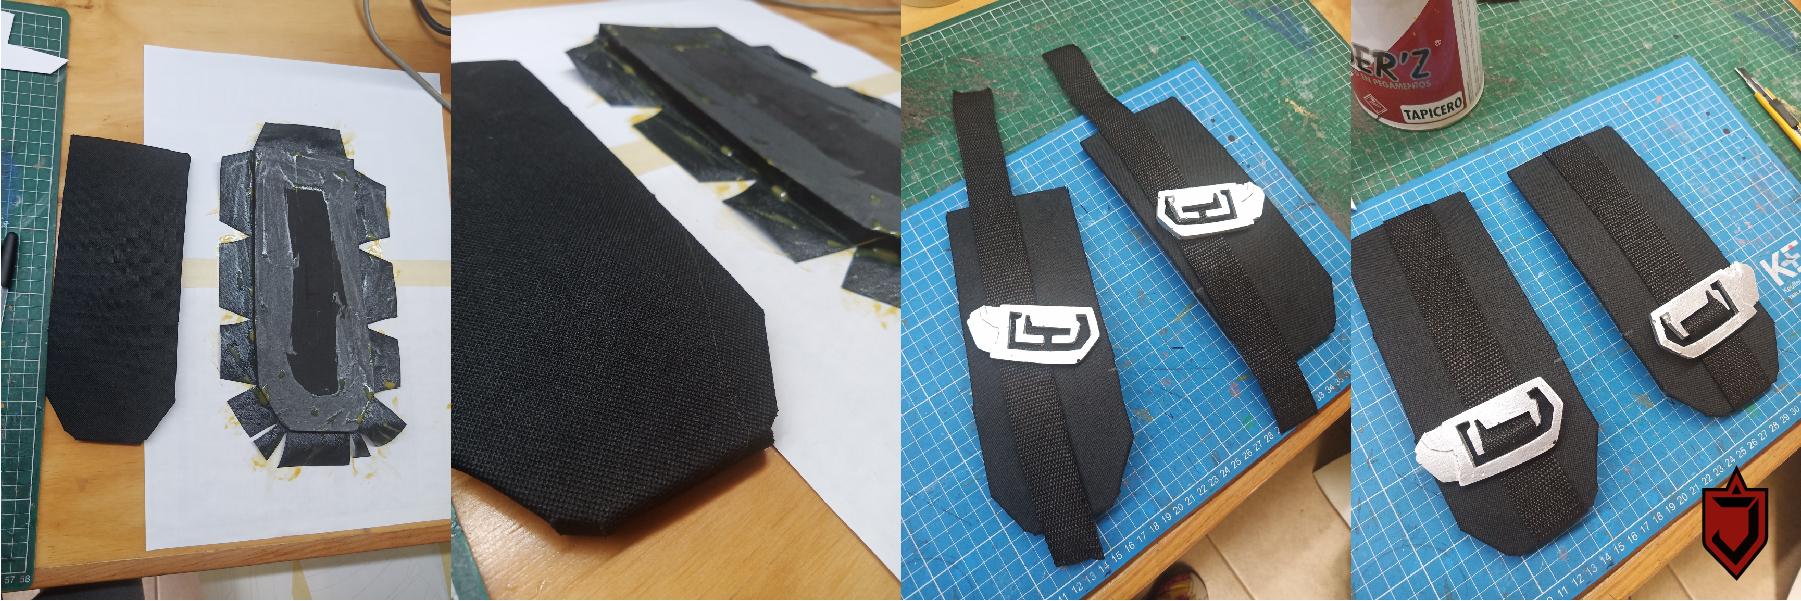 ODST Backpack - Forum-04.jpg